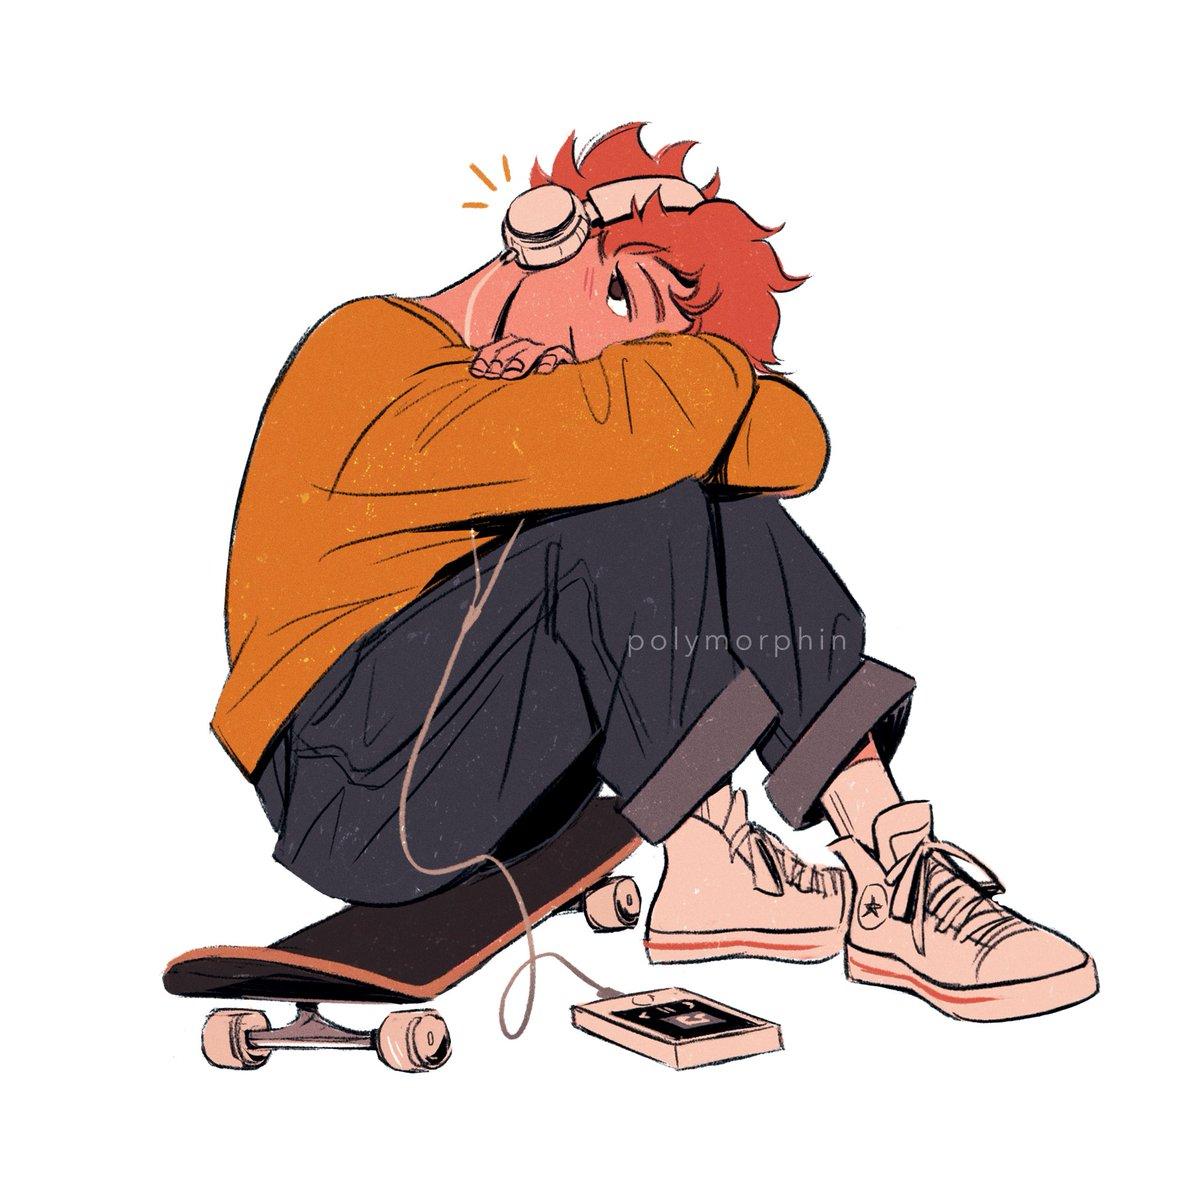 another skateboarder hinata doodle #haikyuu #ハイキュー ✨